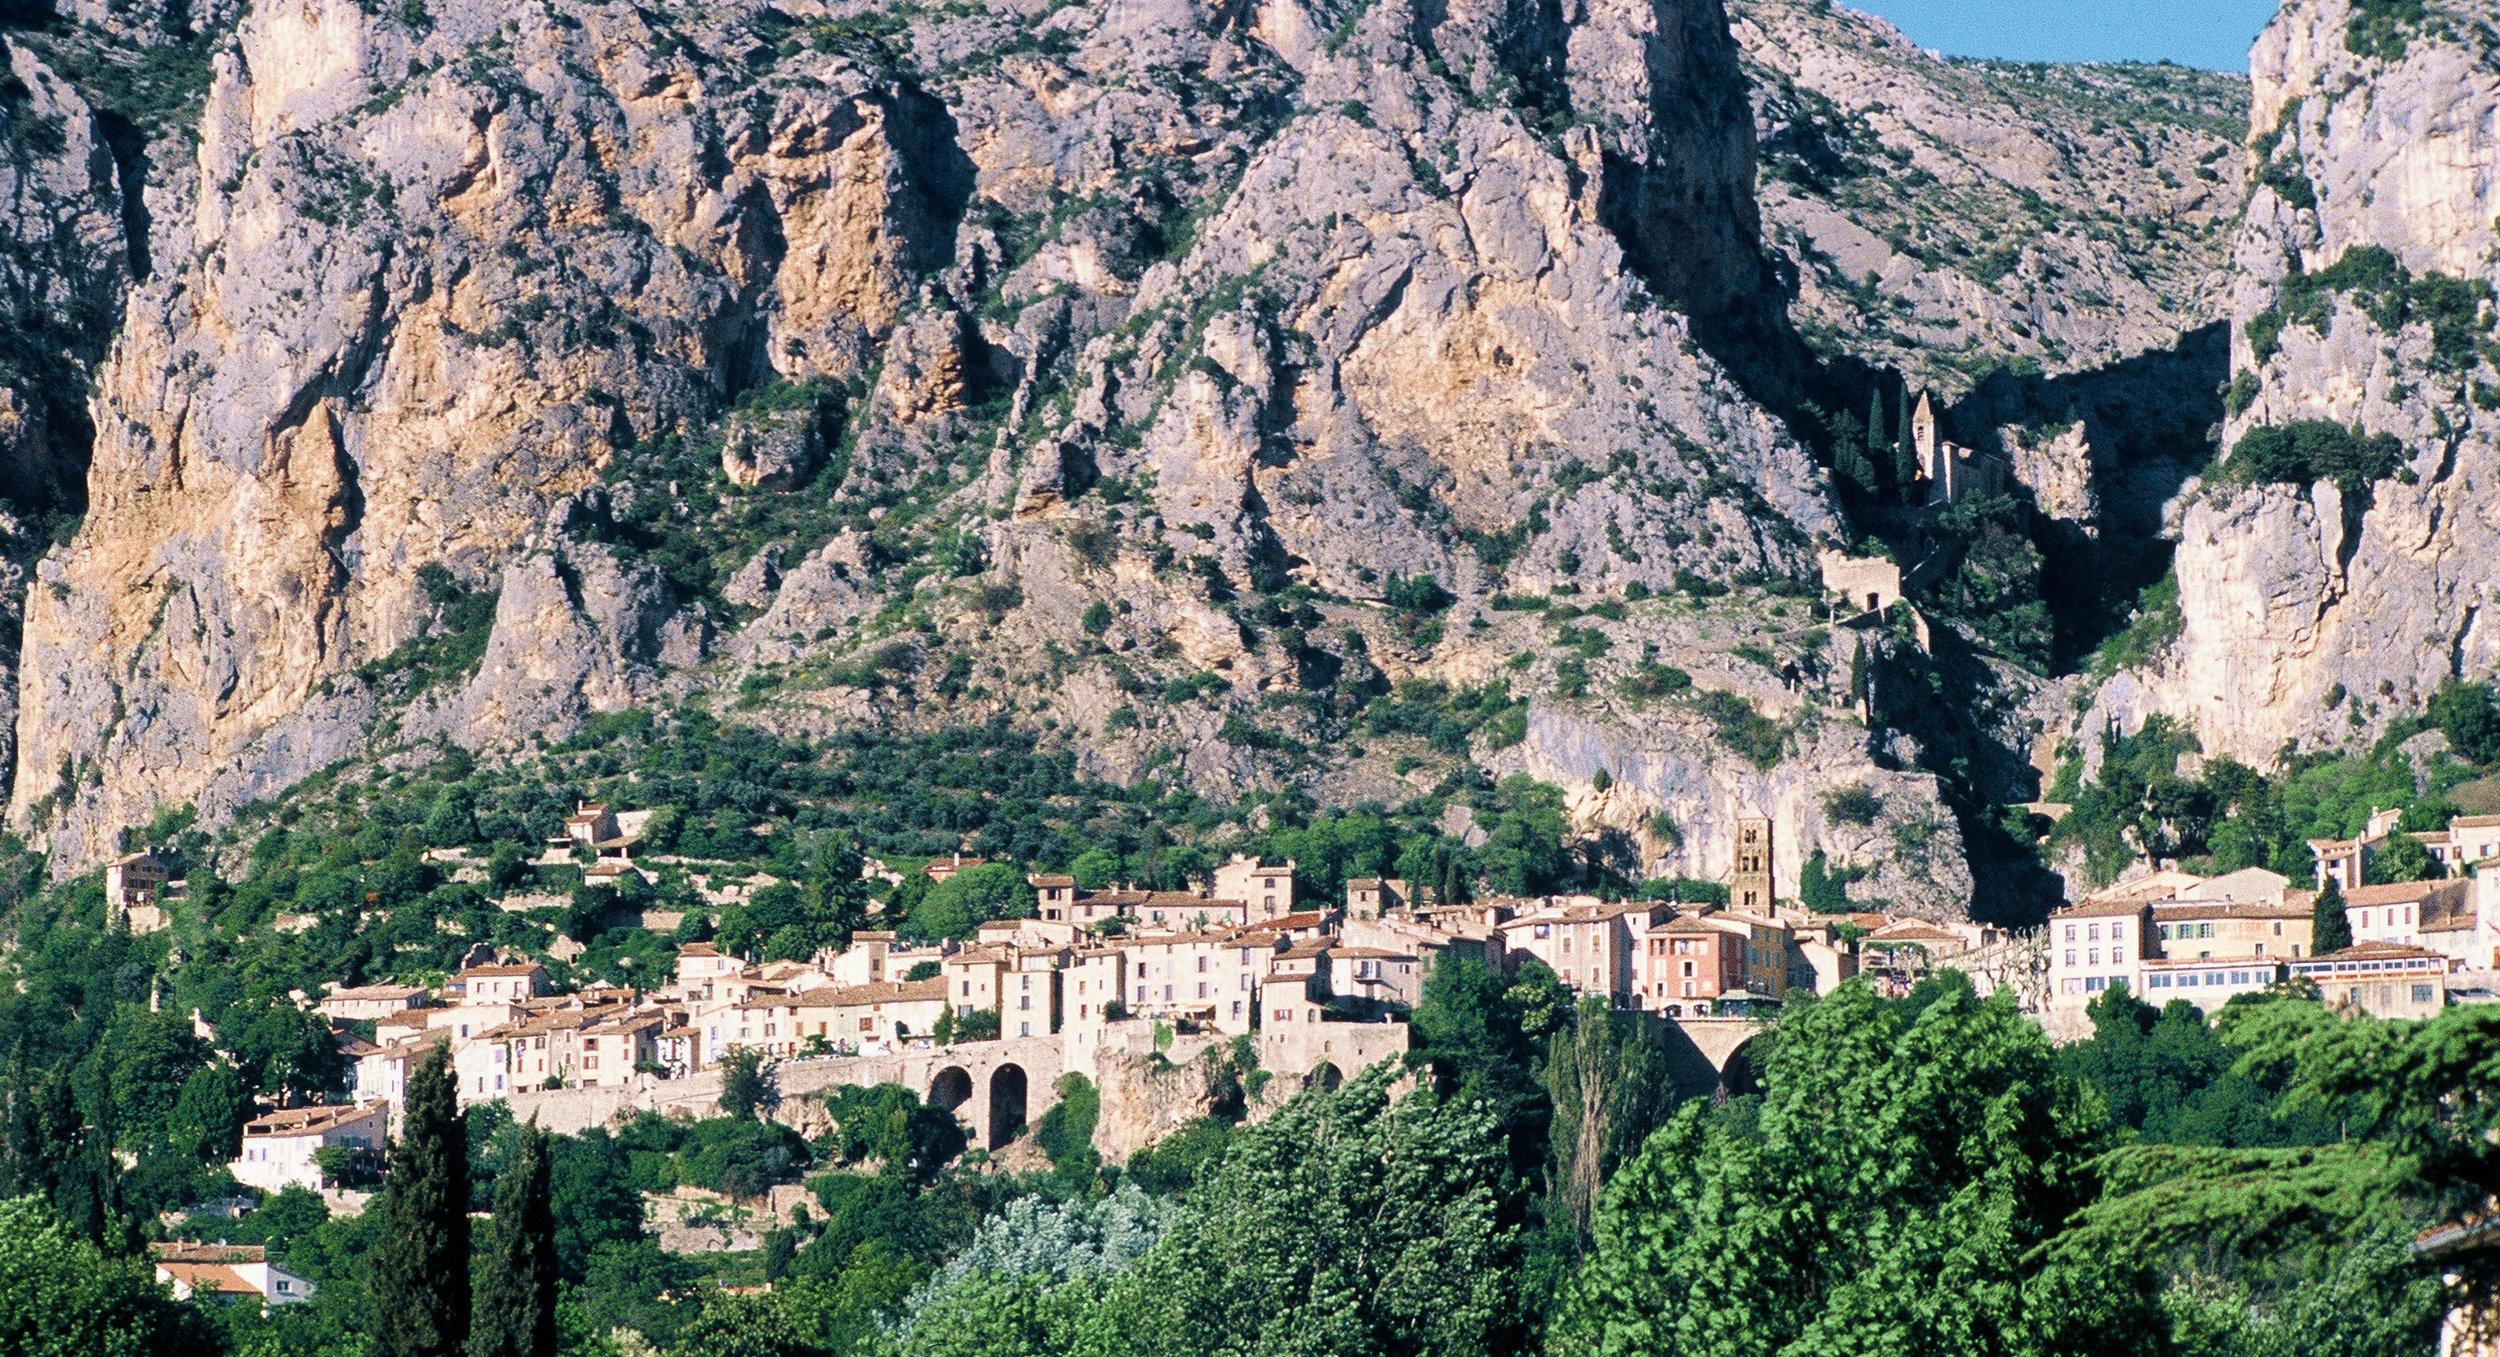 CLICK on Photo: Moustiers Sainte-Marie France 2002 (Kodachrome K-64 Slide Film)